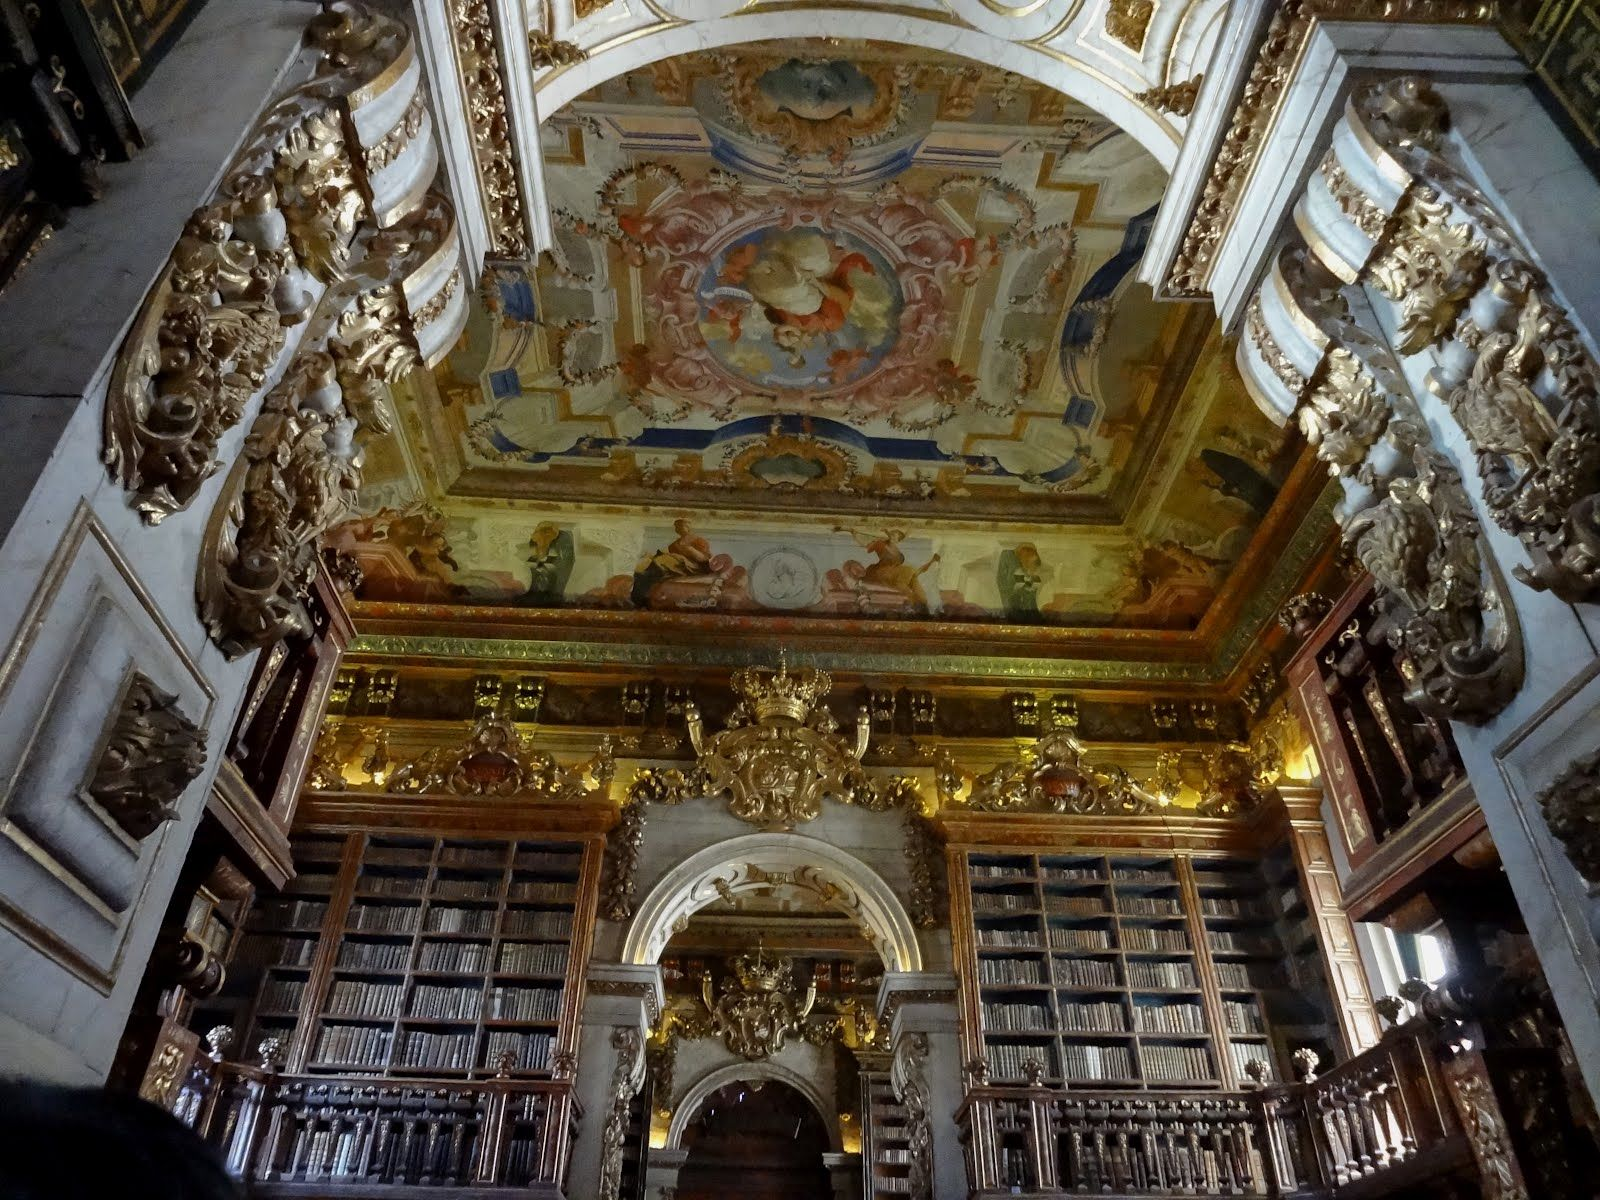 Portugal Universidade De Coimbra Biblioteca Joanina Source Http